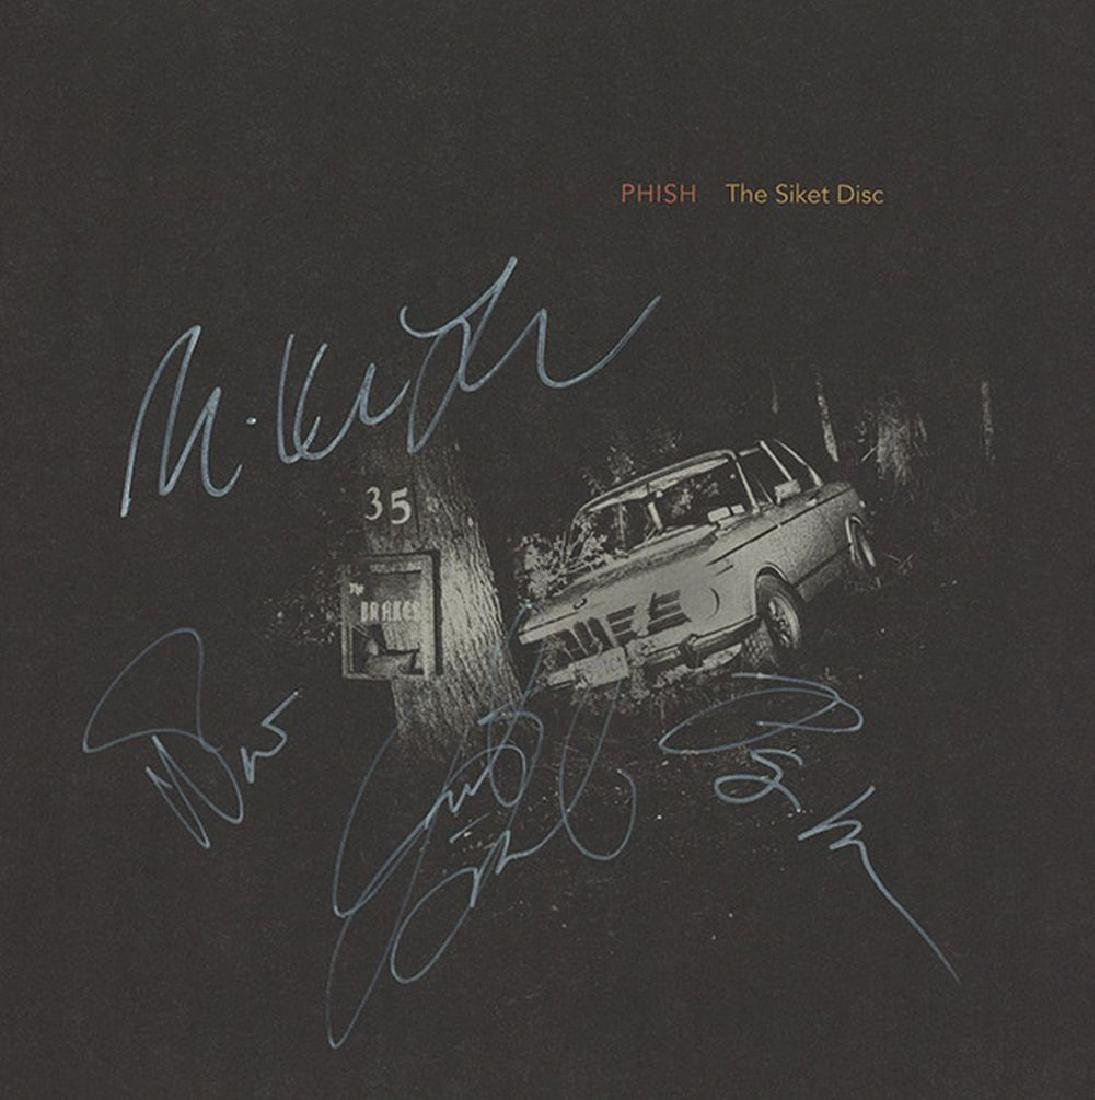 Phish Signed The Siket Disc Album